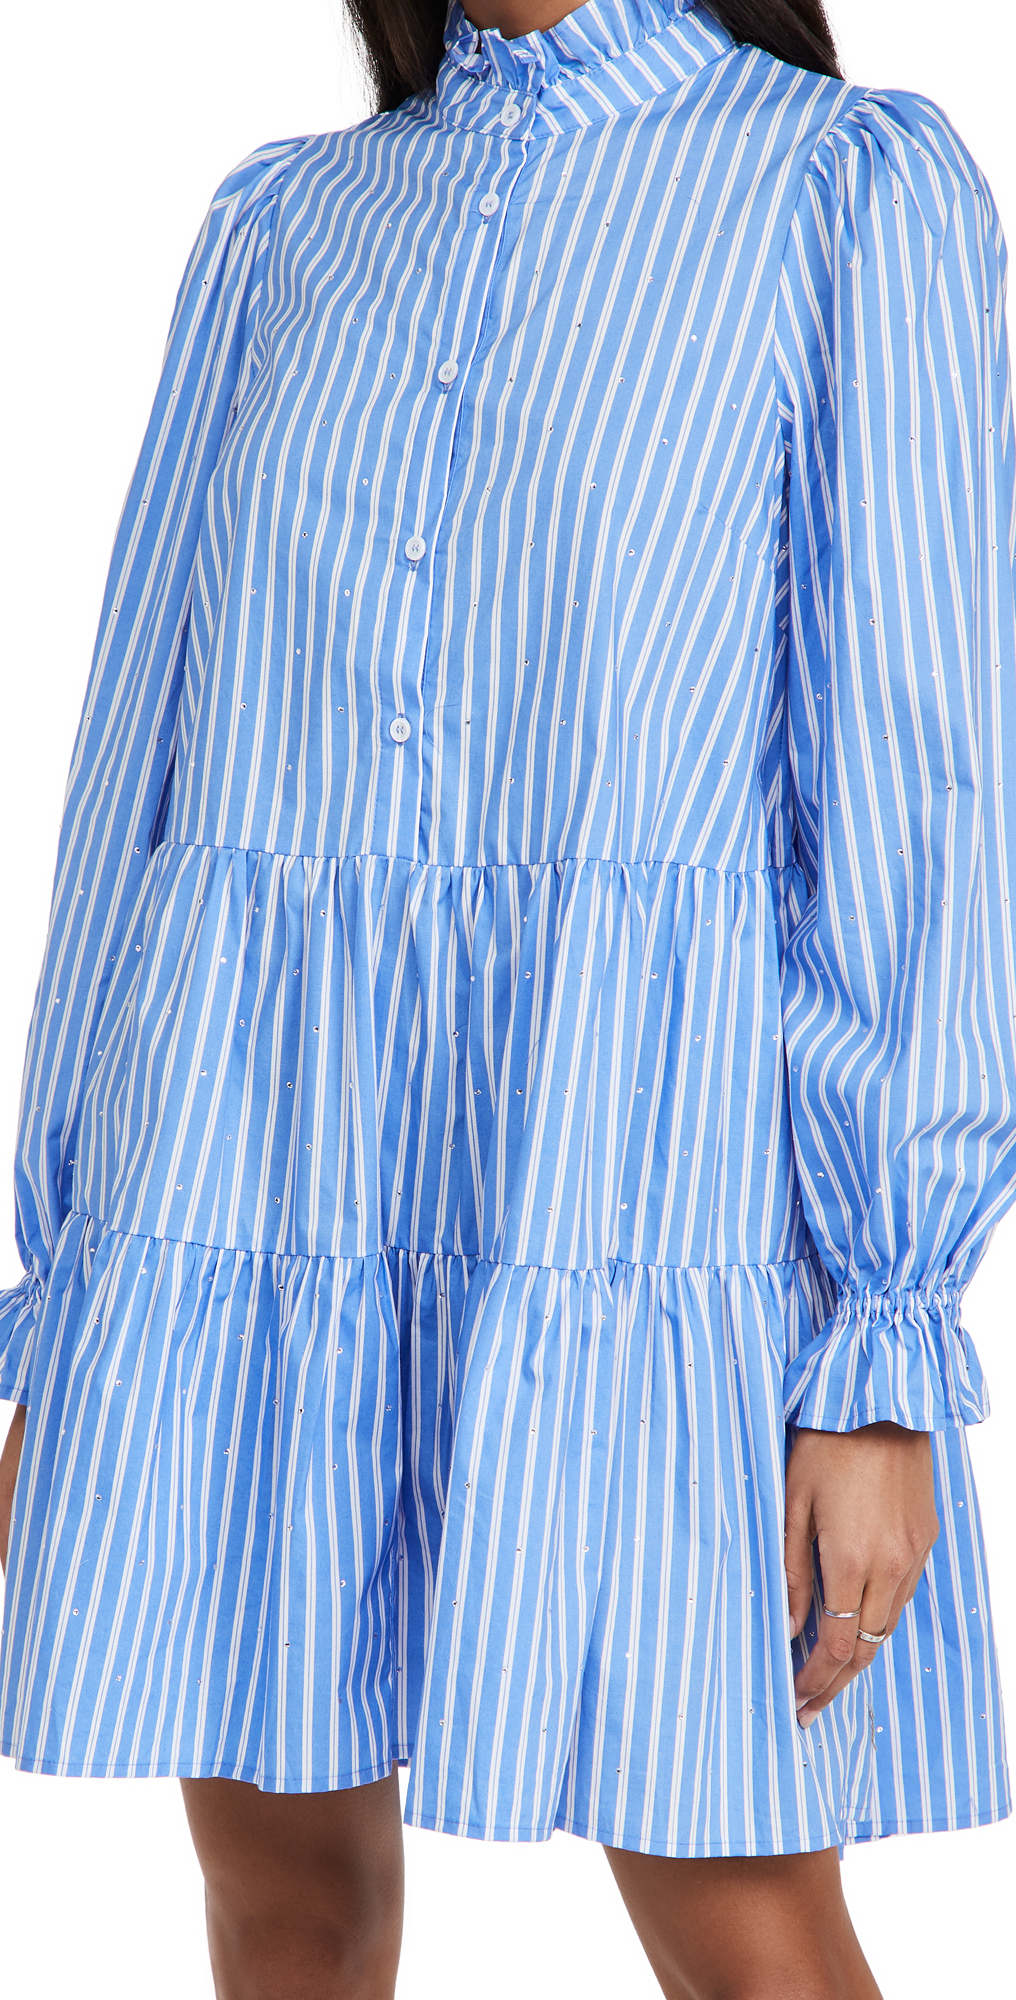 Essentiel Antwerp Zinga Cotton Dress